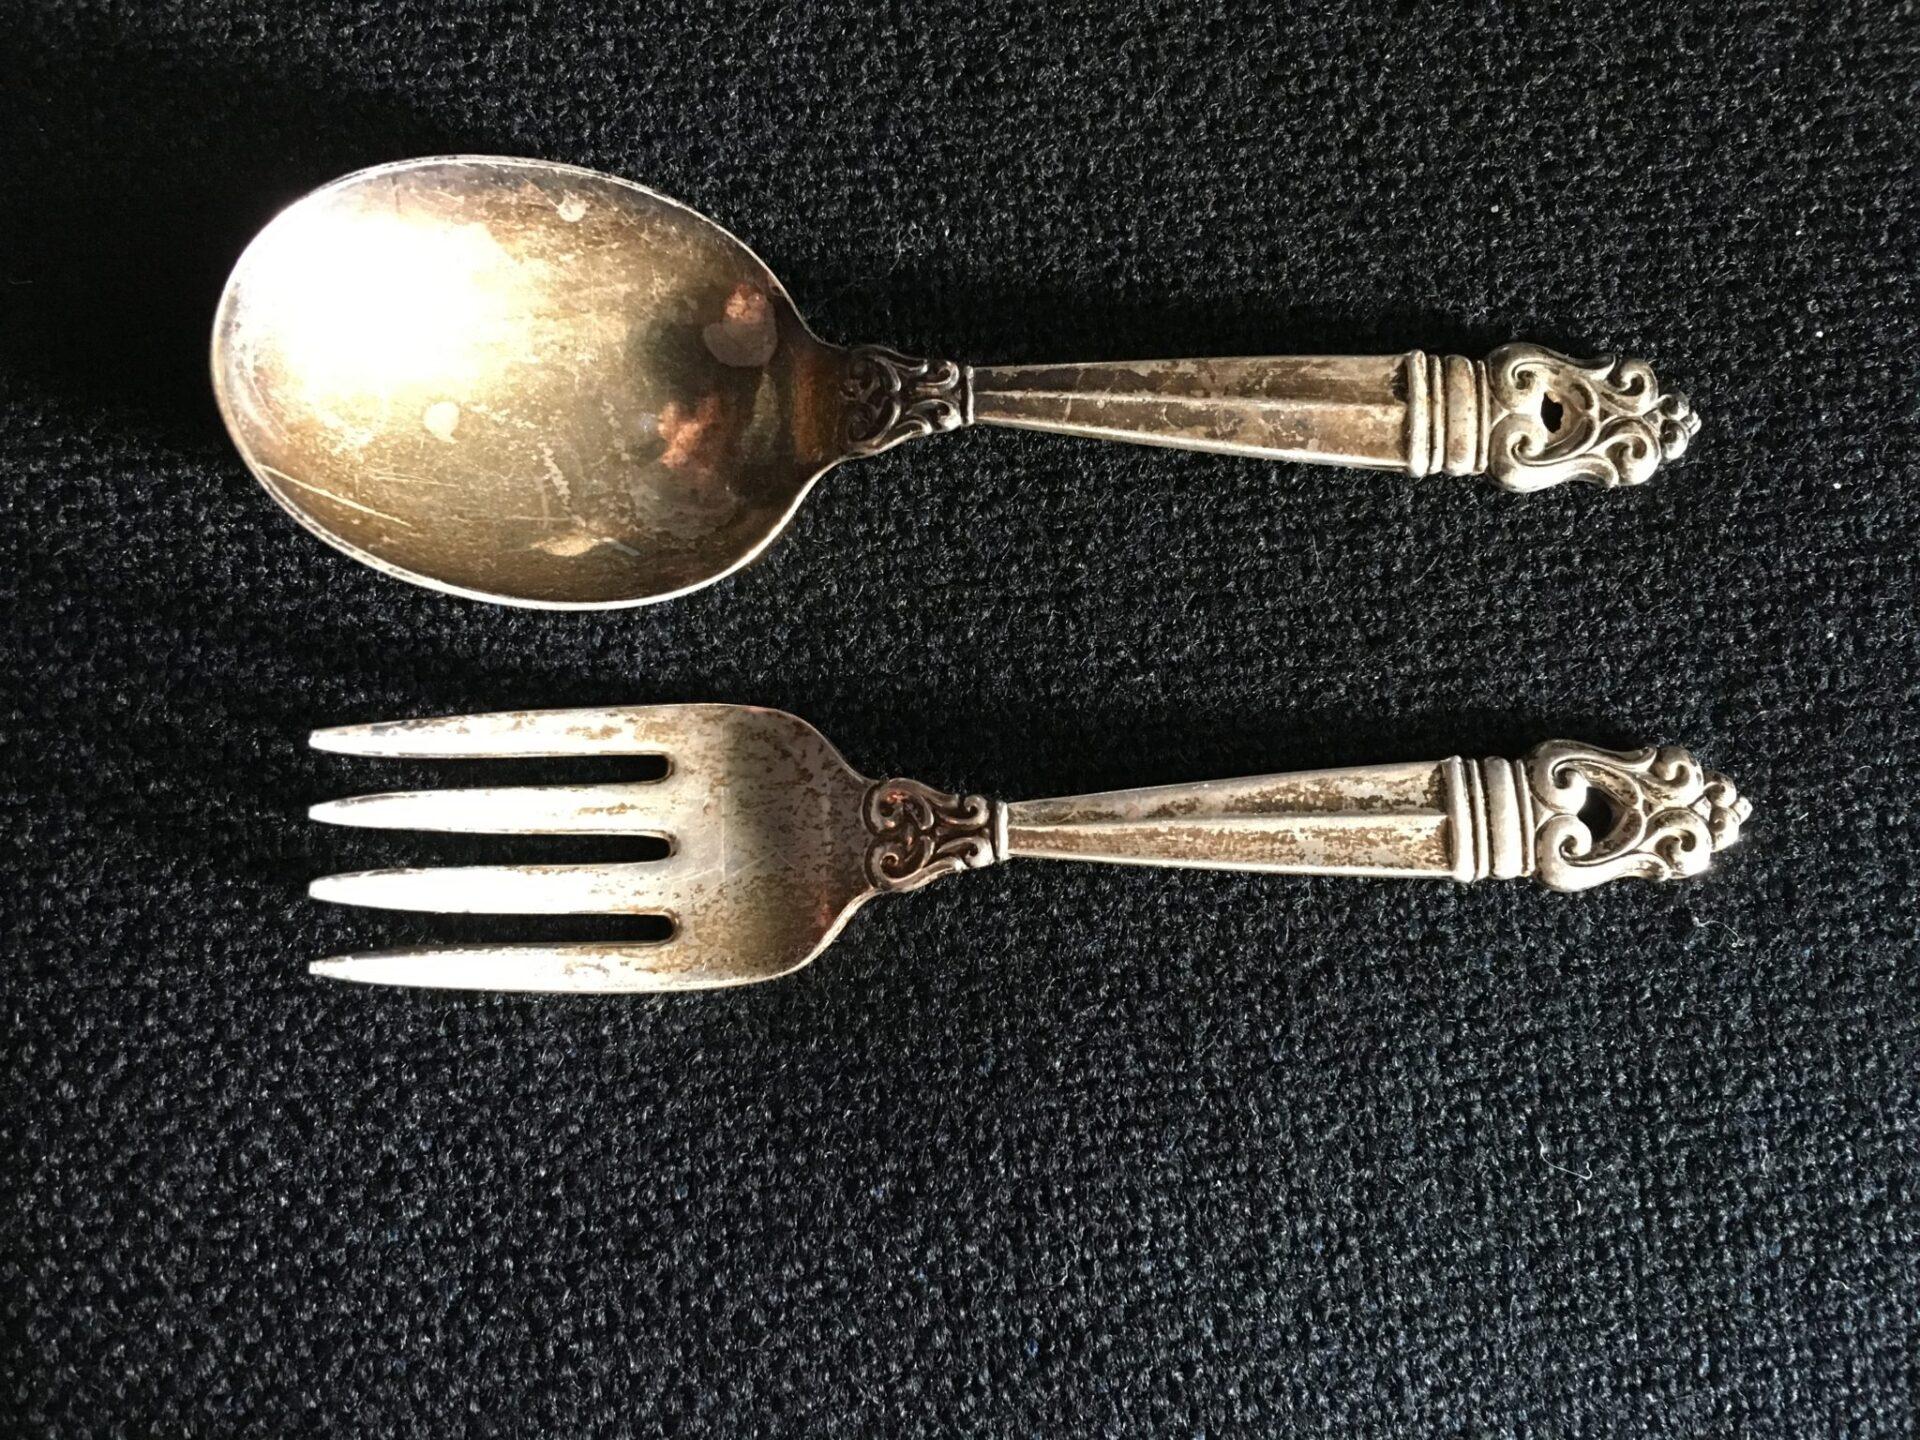 Børnebestik, sterling sølv ialt 600 kr